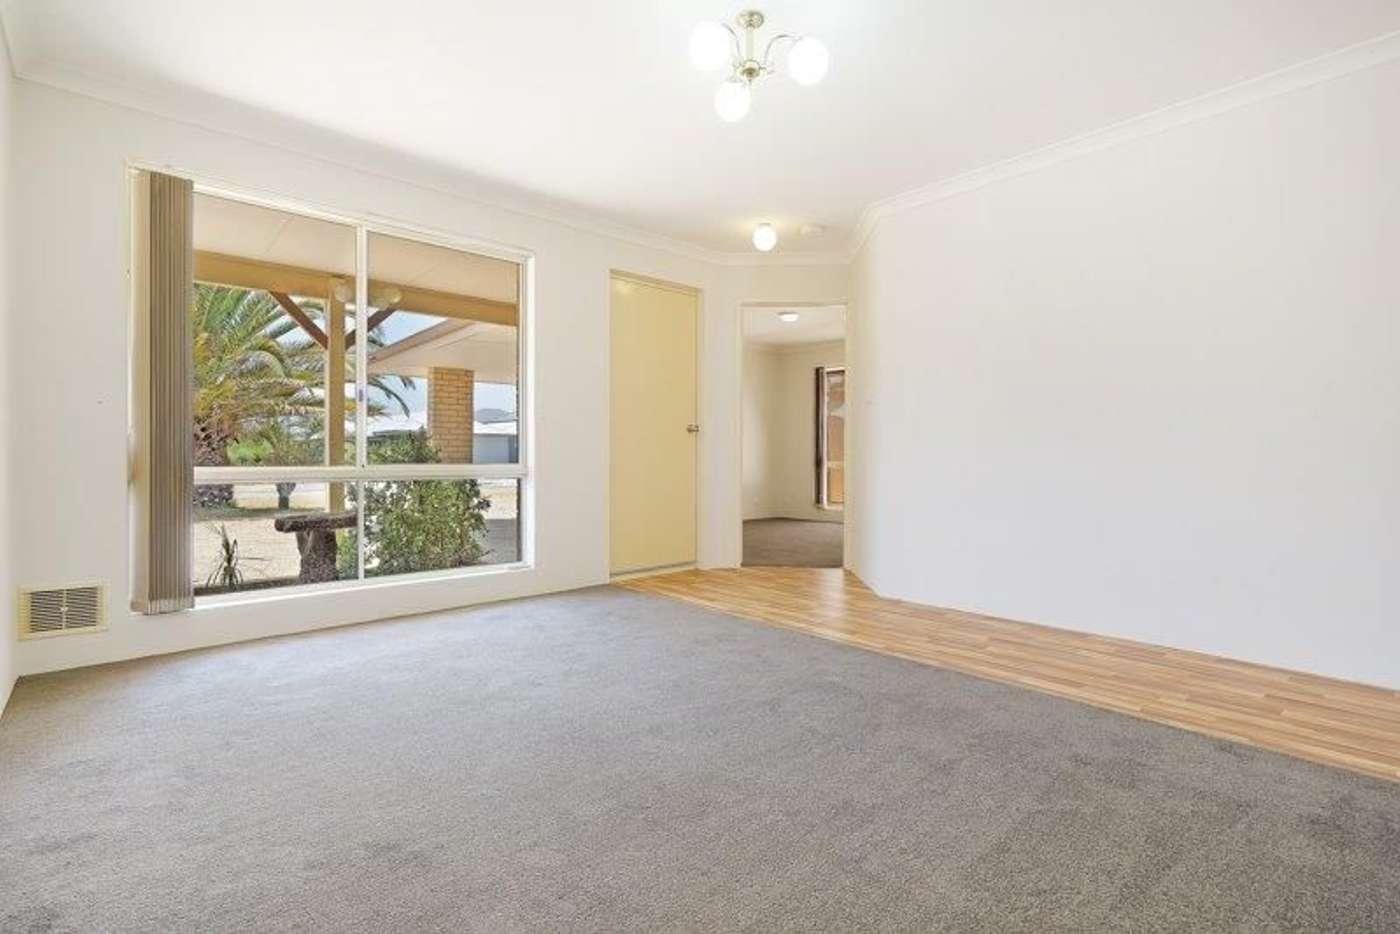 Sixth view of Homely house listing, 1/63 Saw Avenue, Rockingham WA 6168